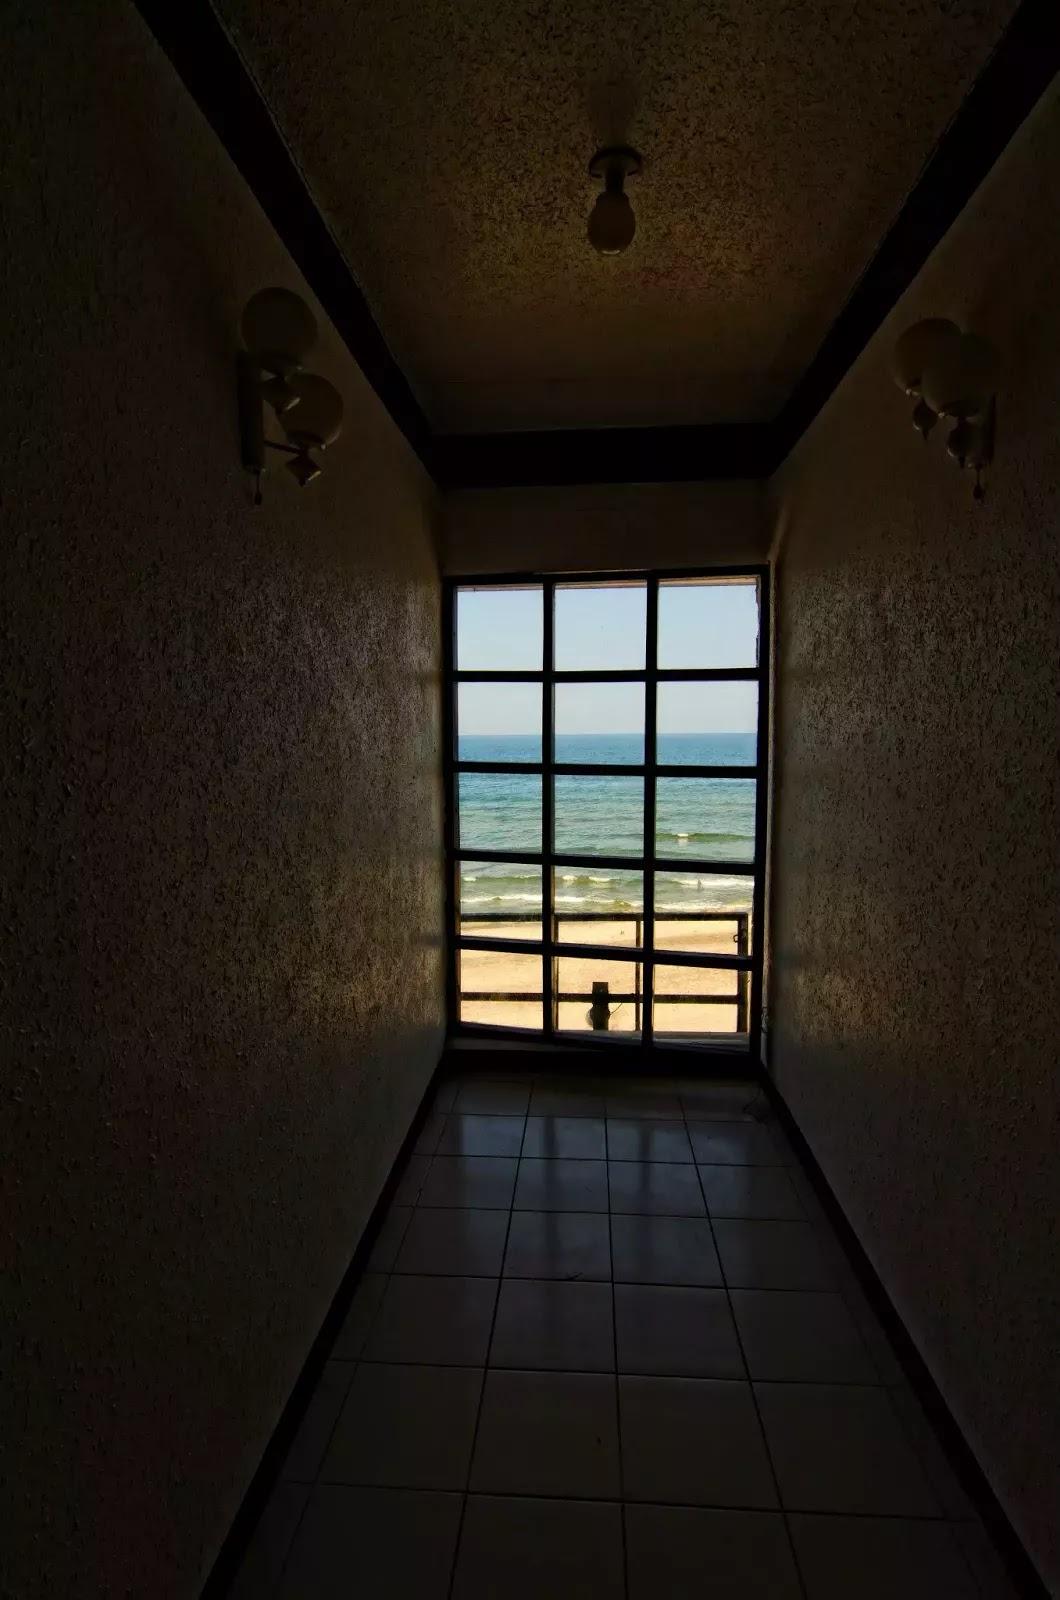 Little Surf Maid Resort Coastal View San Juan San Fernando La Union Region I Philippines.